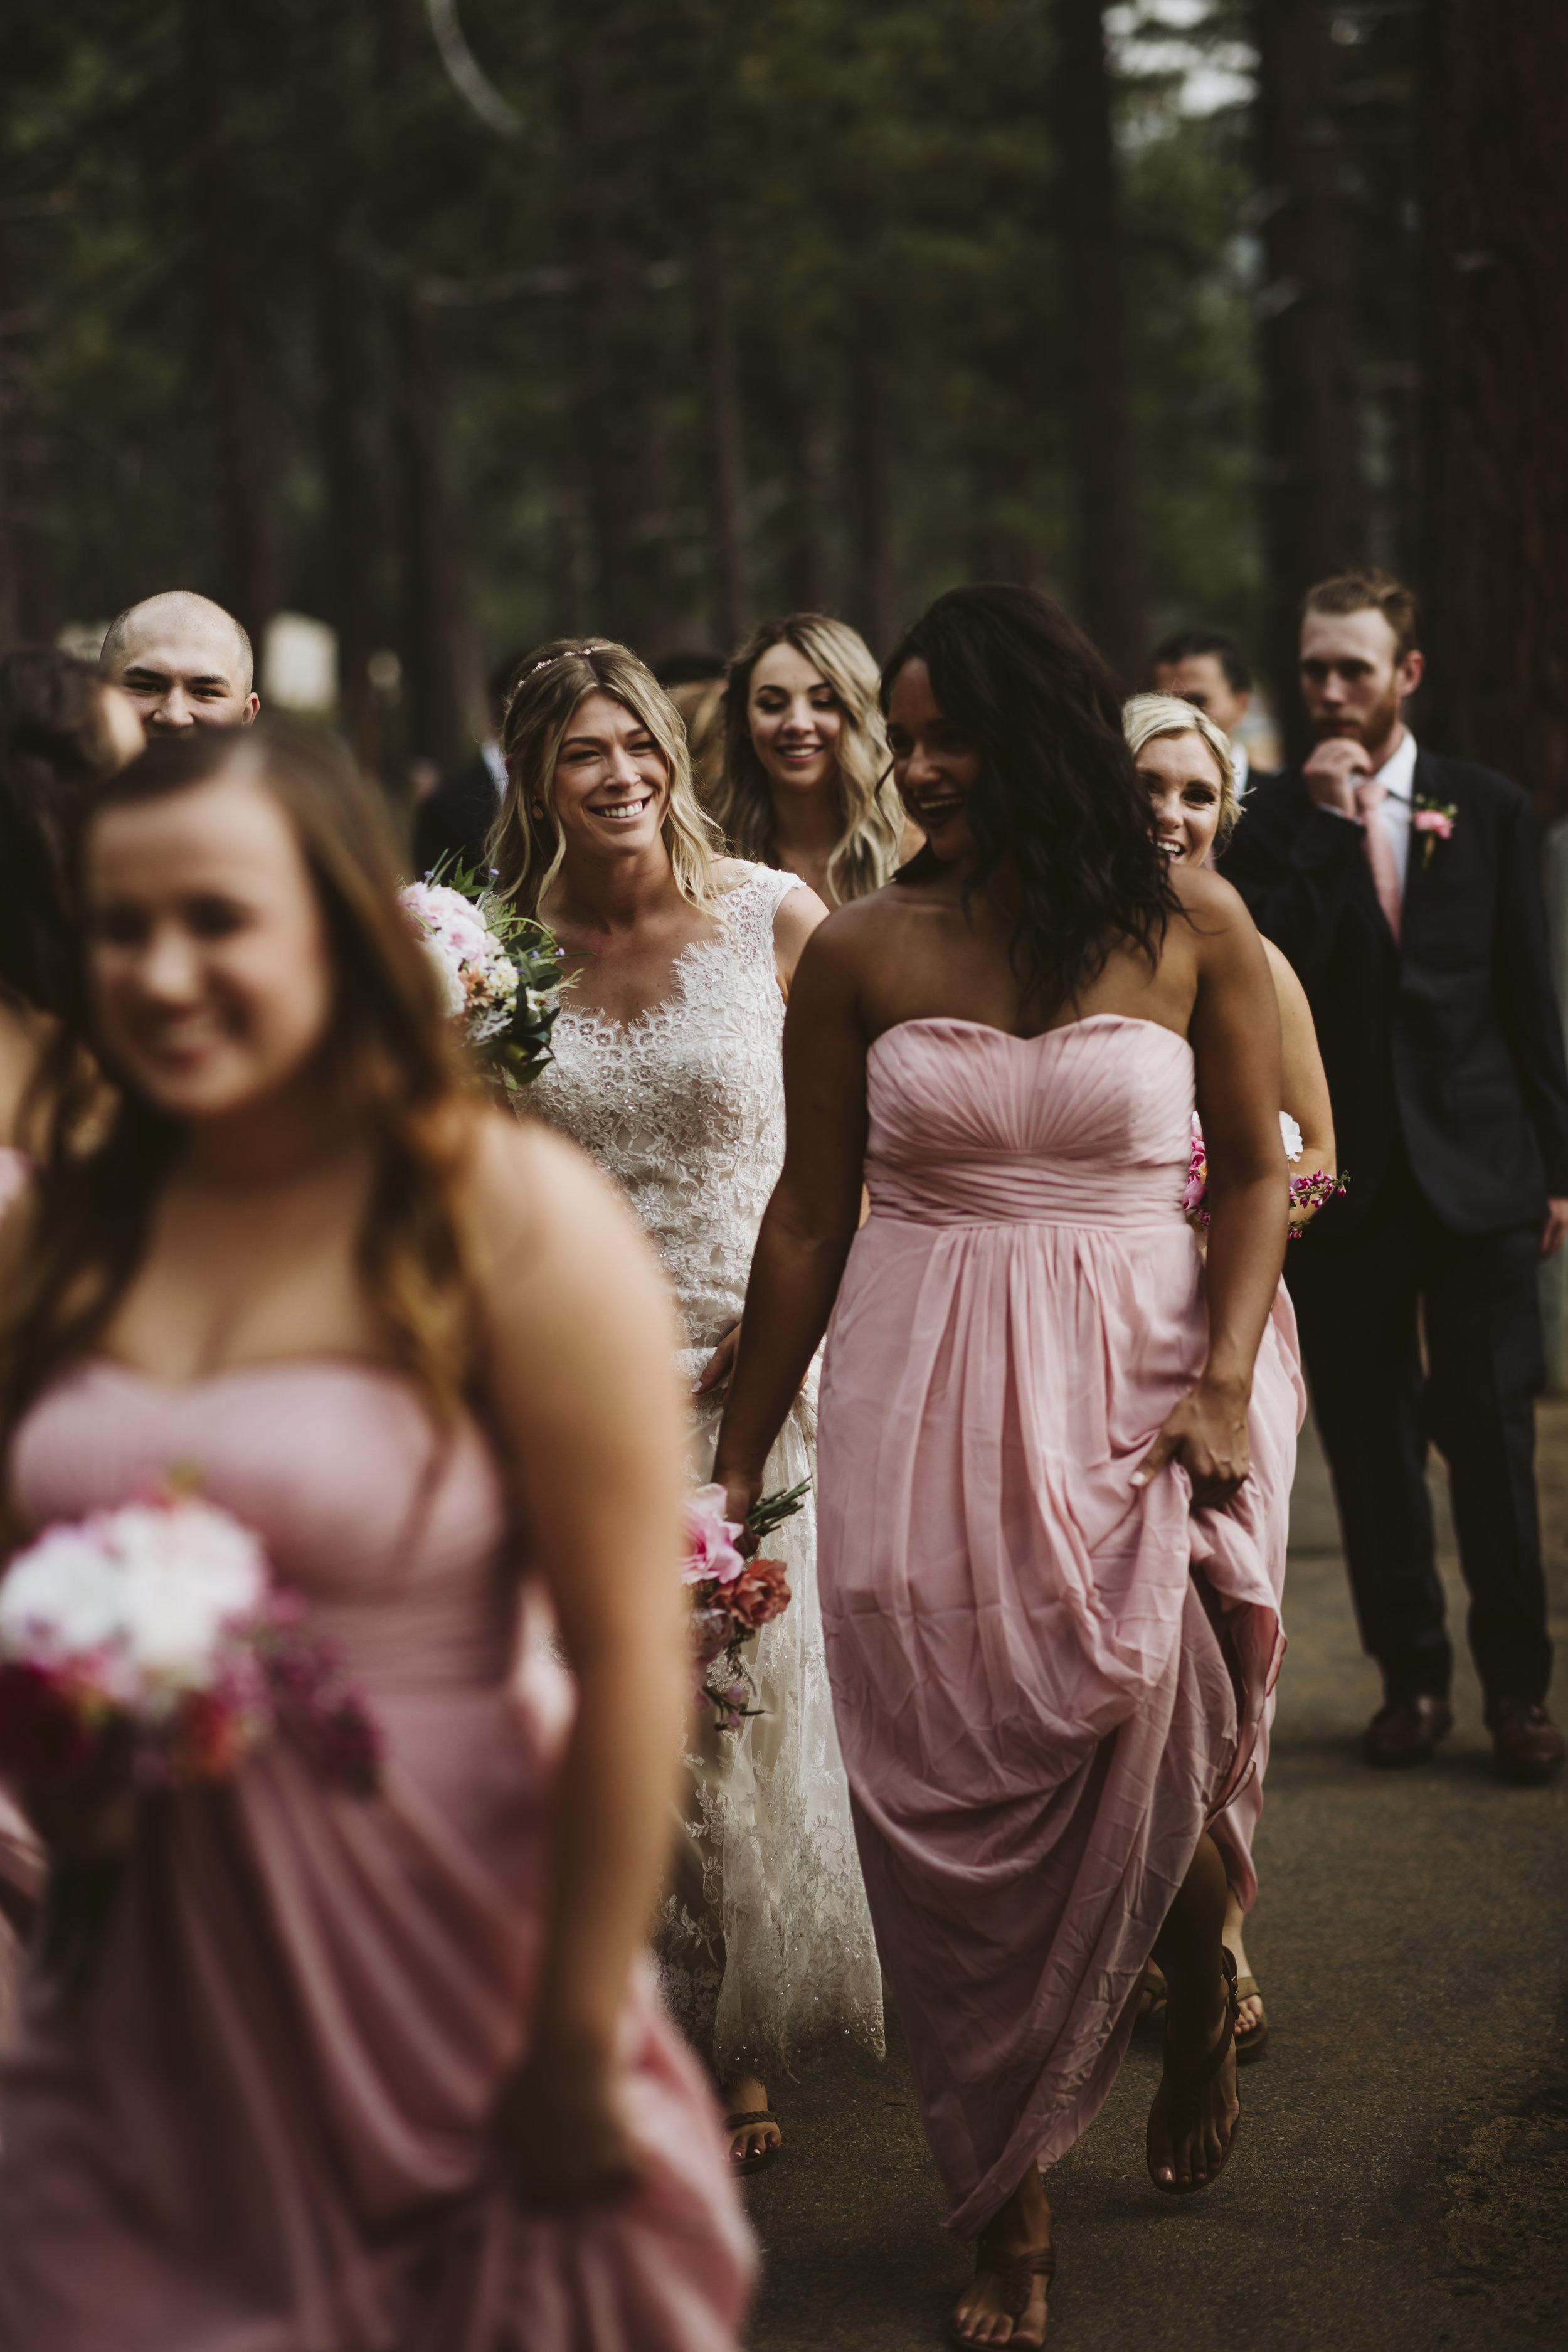 _P8A4333vild-vild photography-photography-wedding-wedding photography-tahoe-lake tahoe-lake tahoe wedding photographer-nevada wedding photographer-mountain wedding.jpg